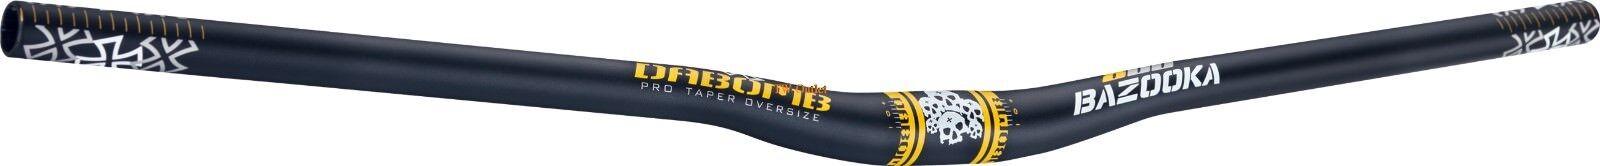 nuovo Da Bomb BAZOOKA 800 MTB AMDH Riser 9° Helebar 31.8 mm800mm 3 Colorees